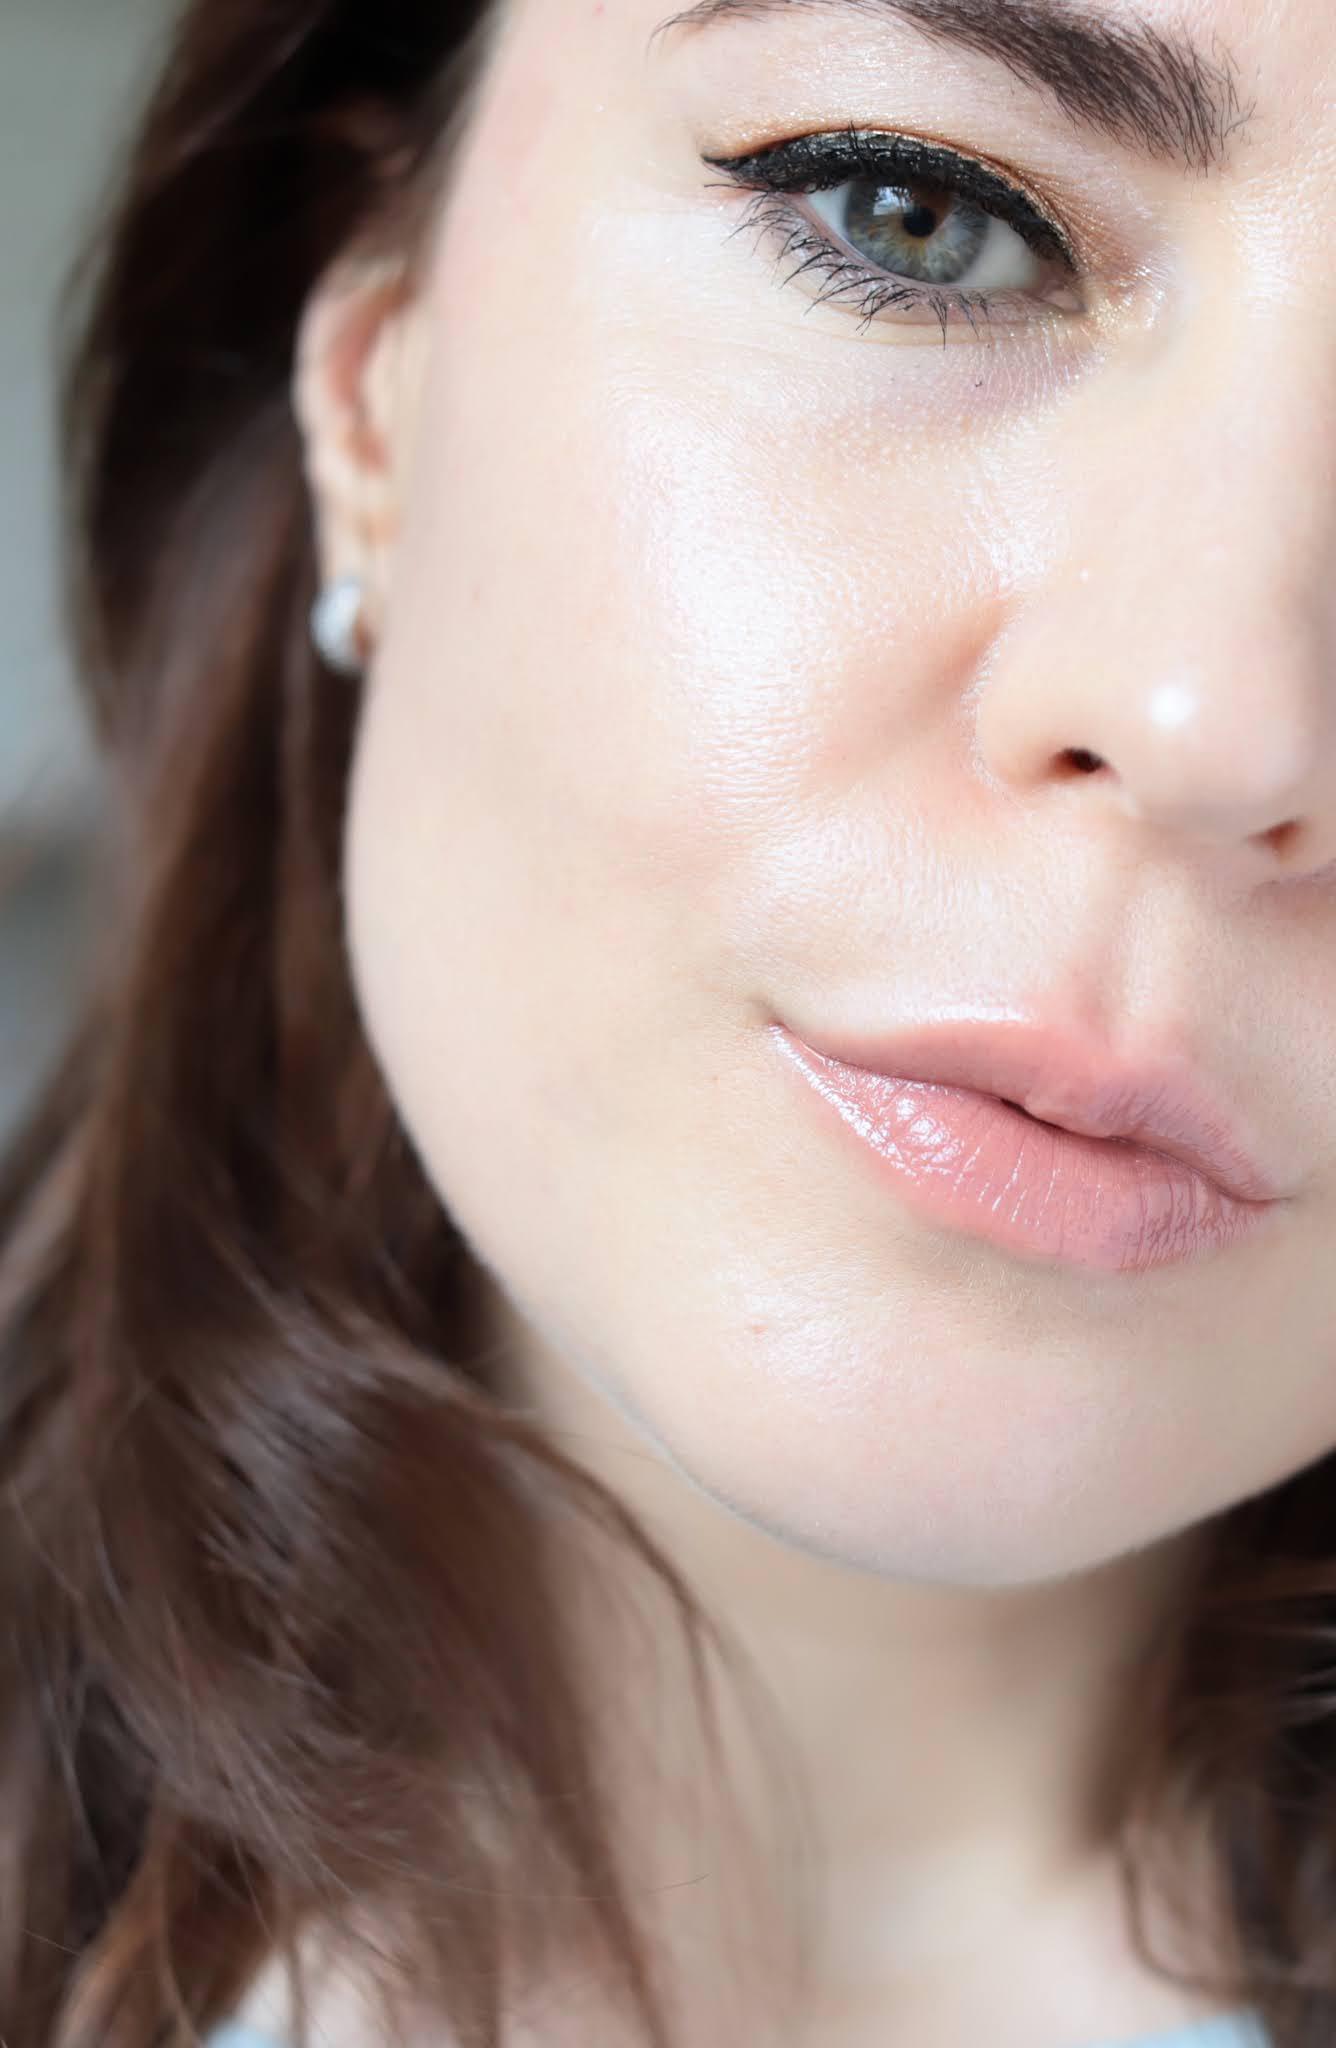 Make Up For ever Watertone fond de teint test et avis